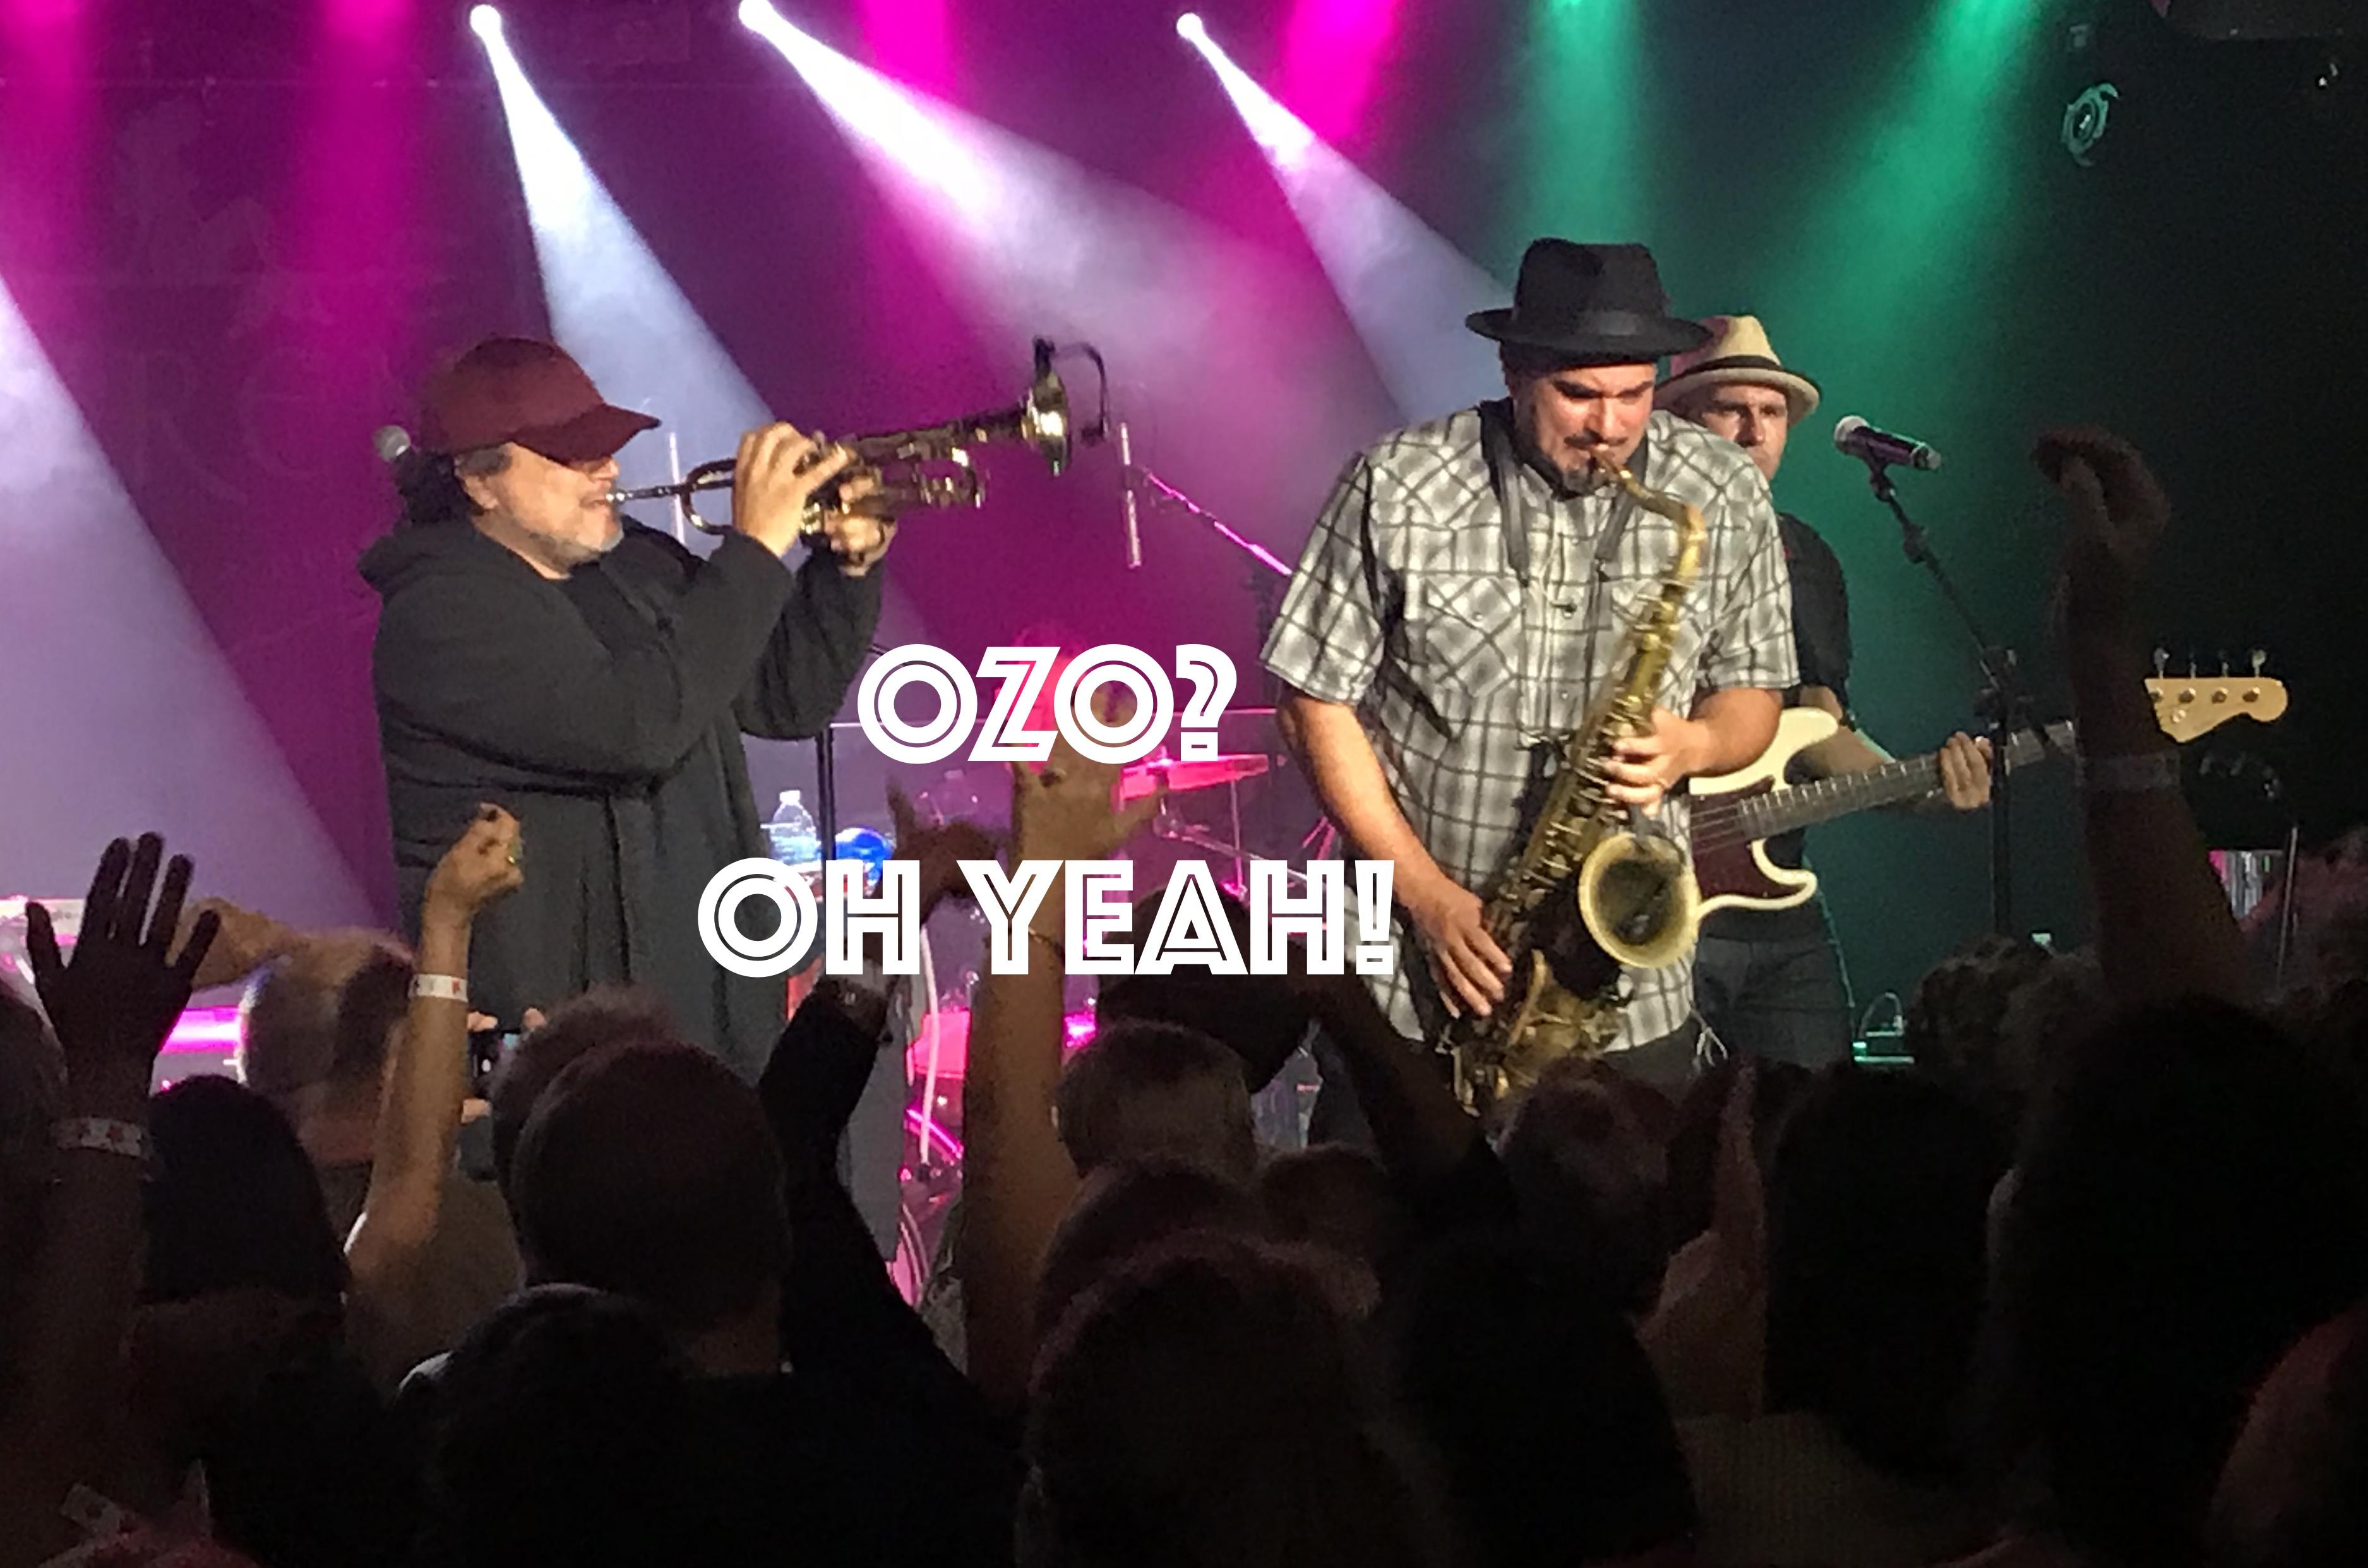 OZO? Oh Yeah! Ozomotli Concert Review, InnerEdgeMusic.com